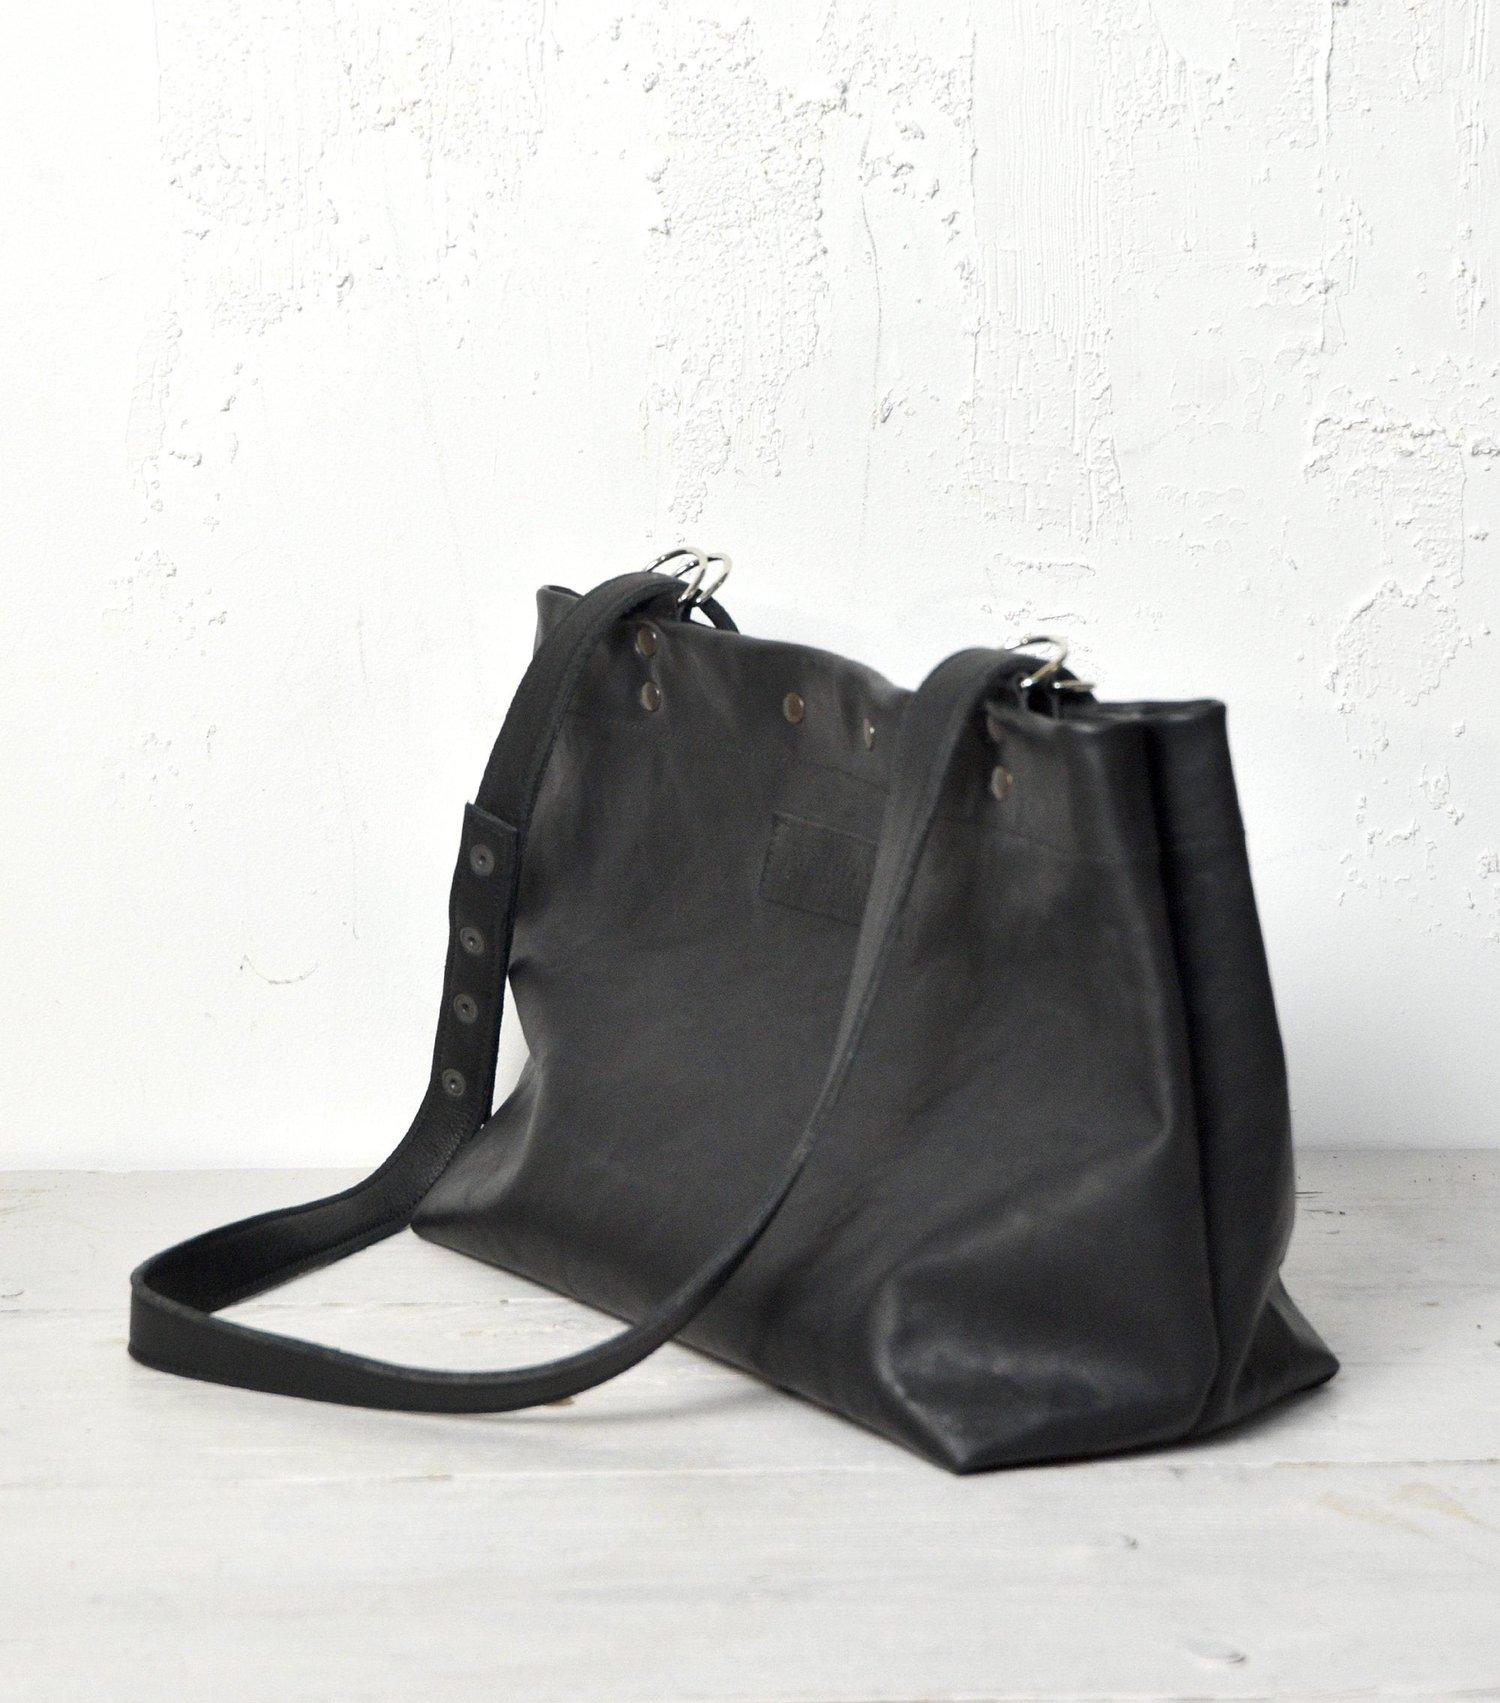 Image of Versatile Black Leather Case